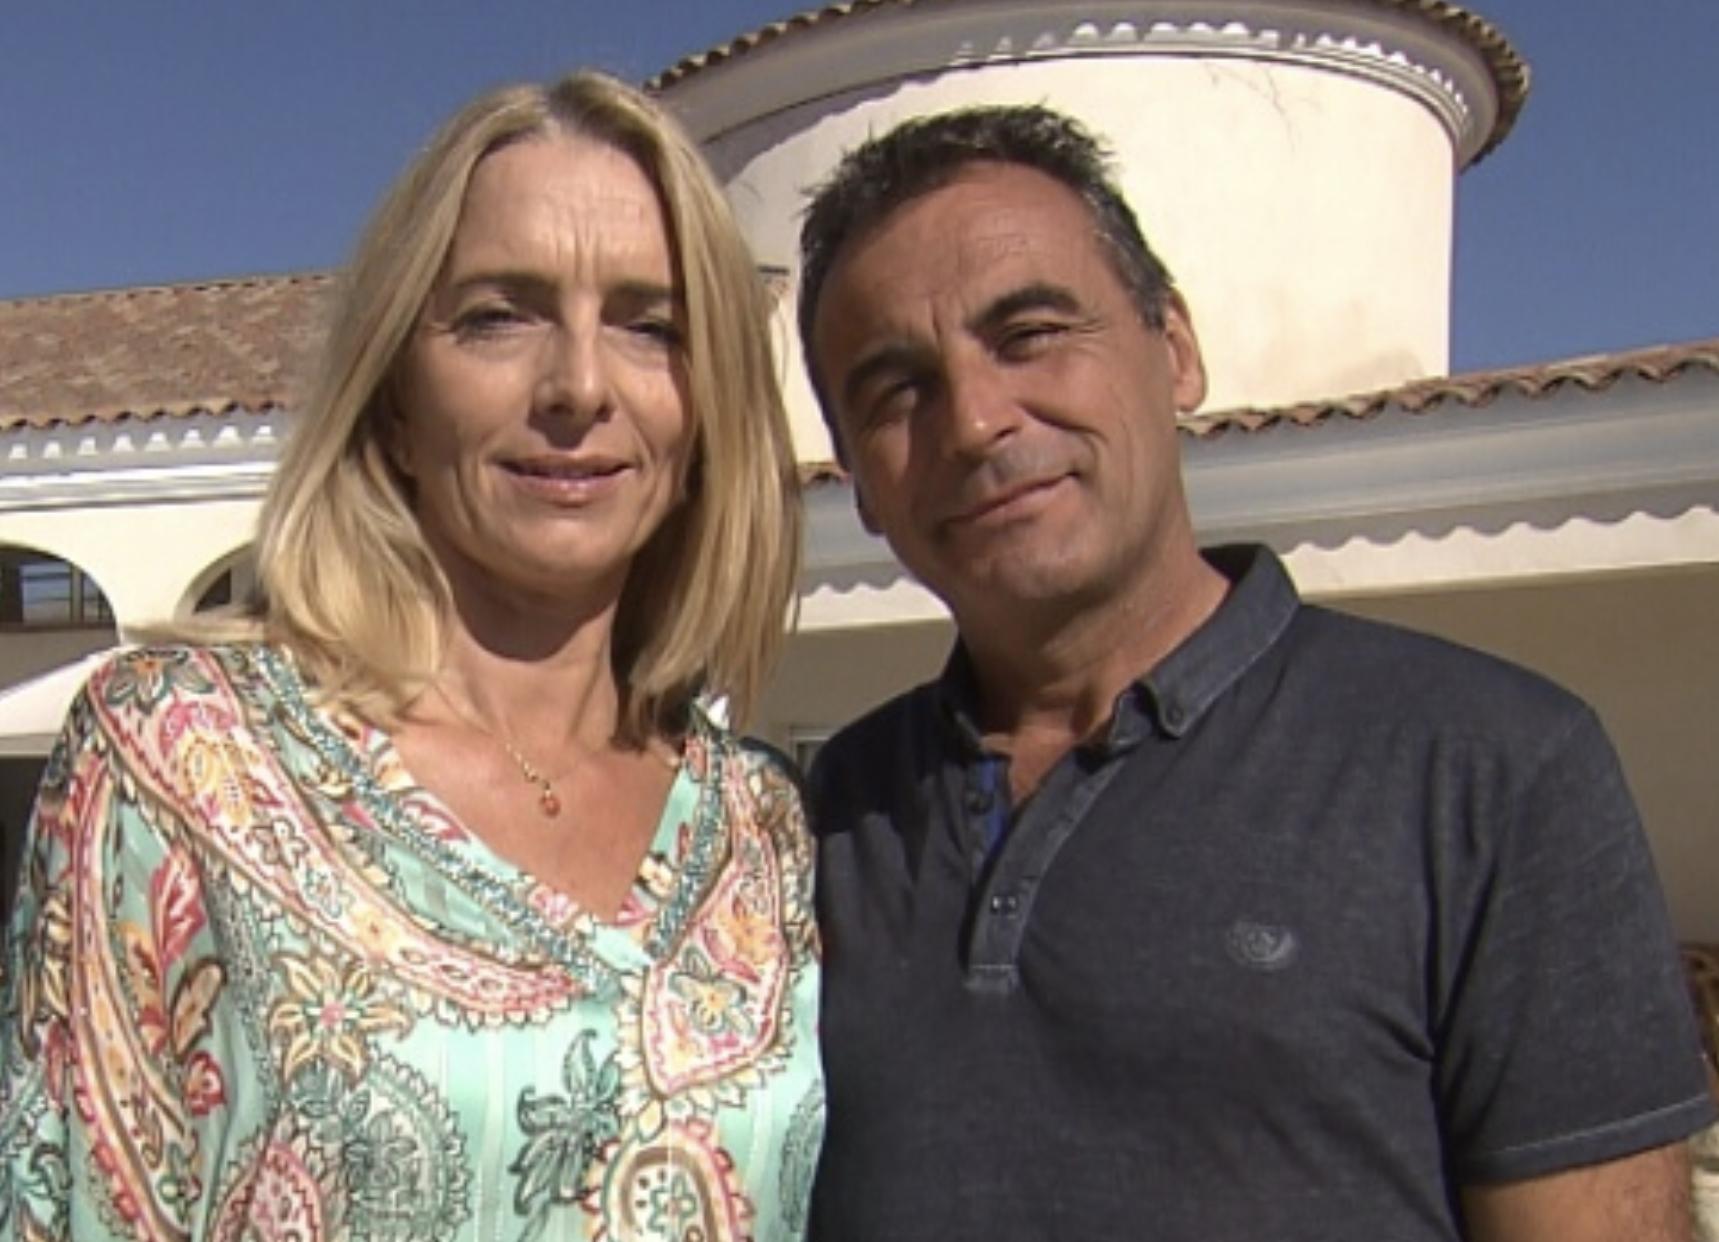 Bienvenue chez Nous sur TF1 : un couple de Sarrola-Carcopino représente la Corse